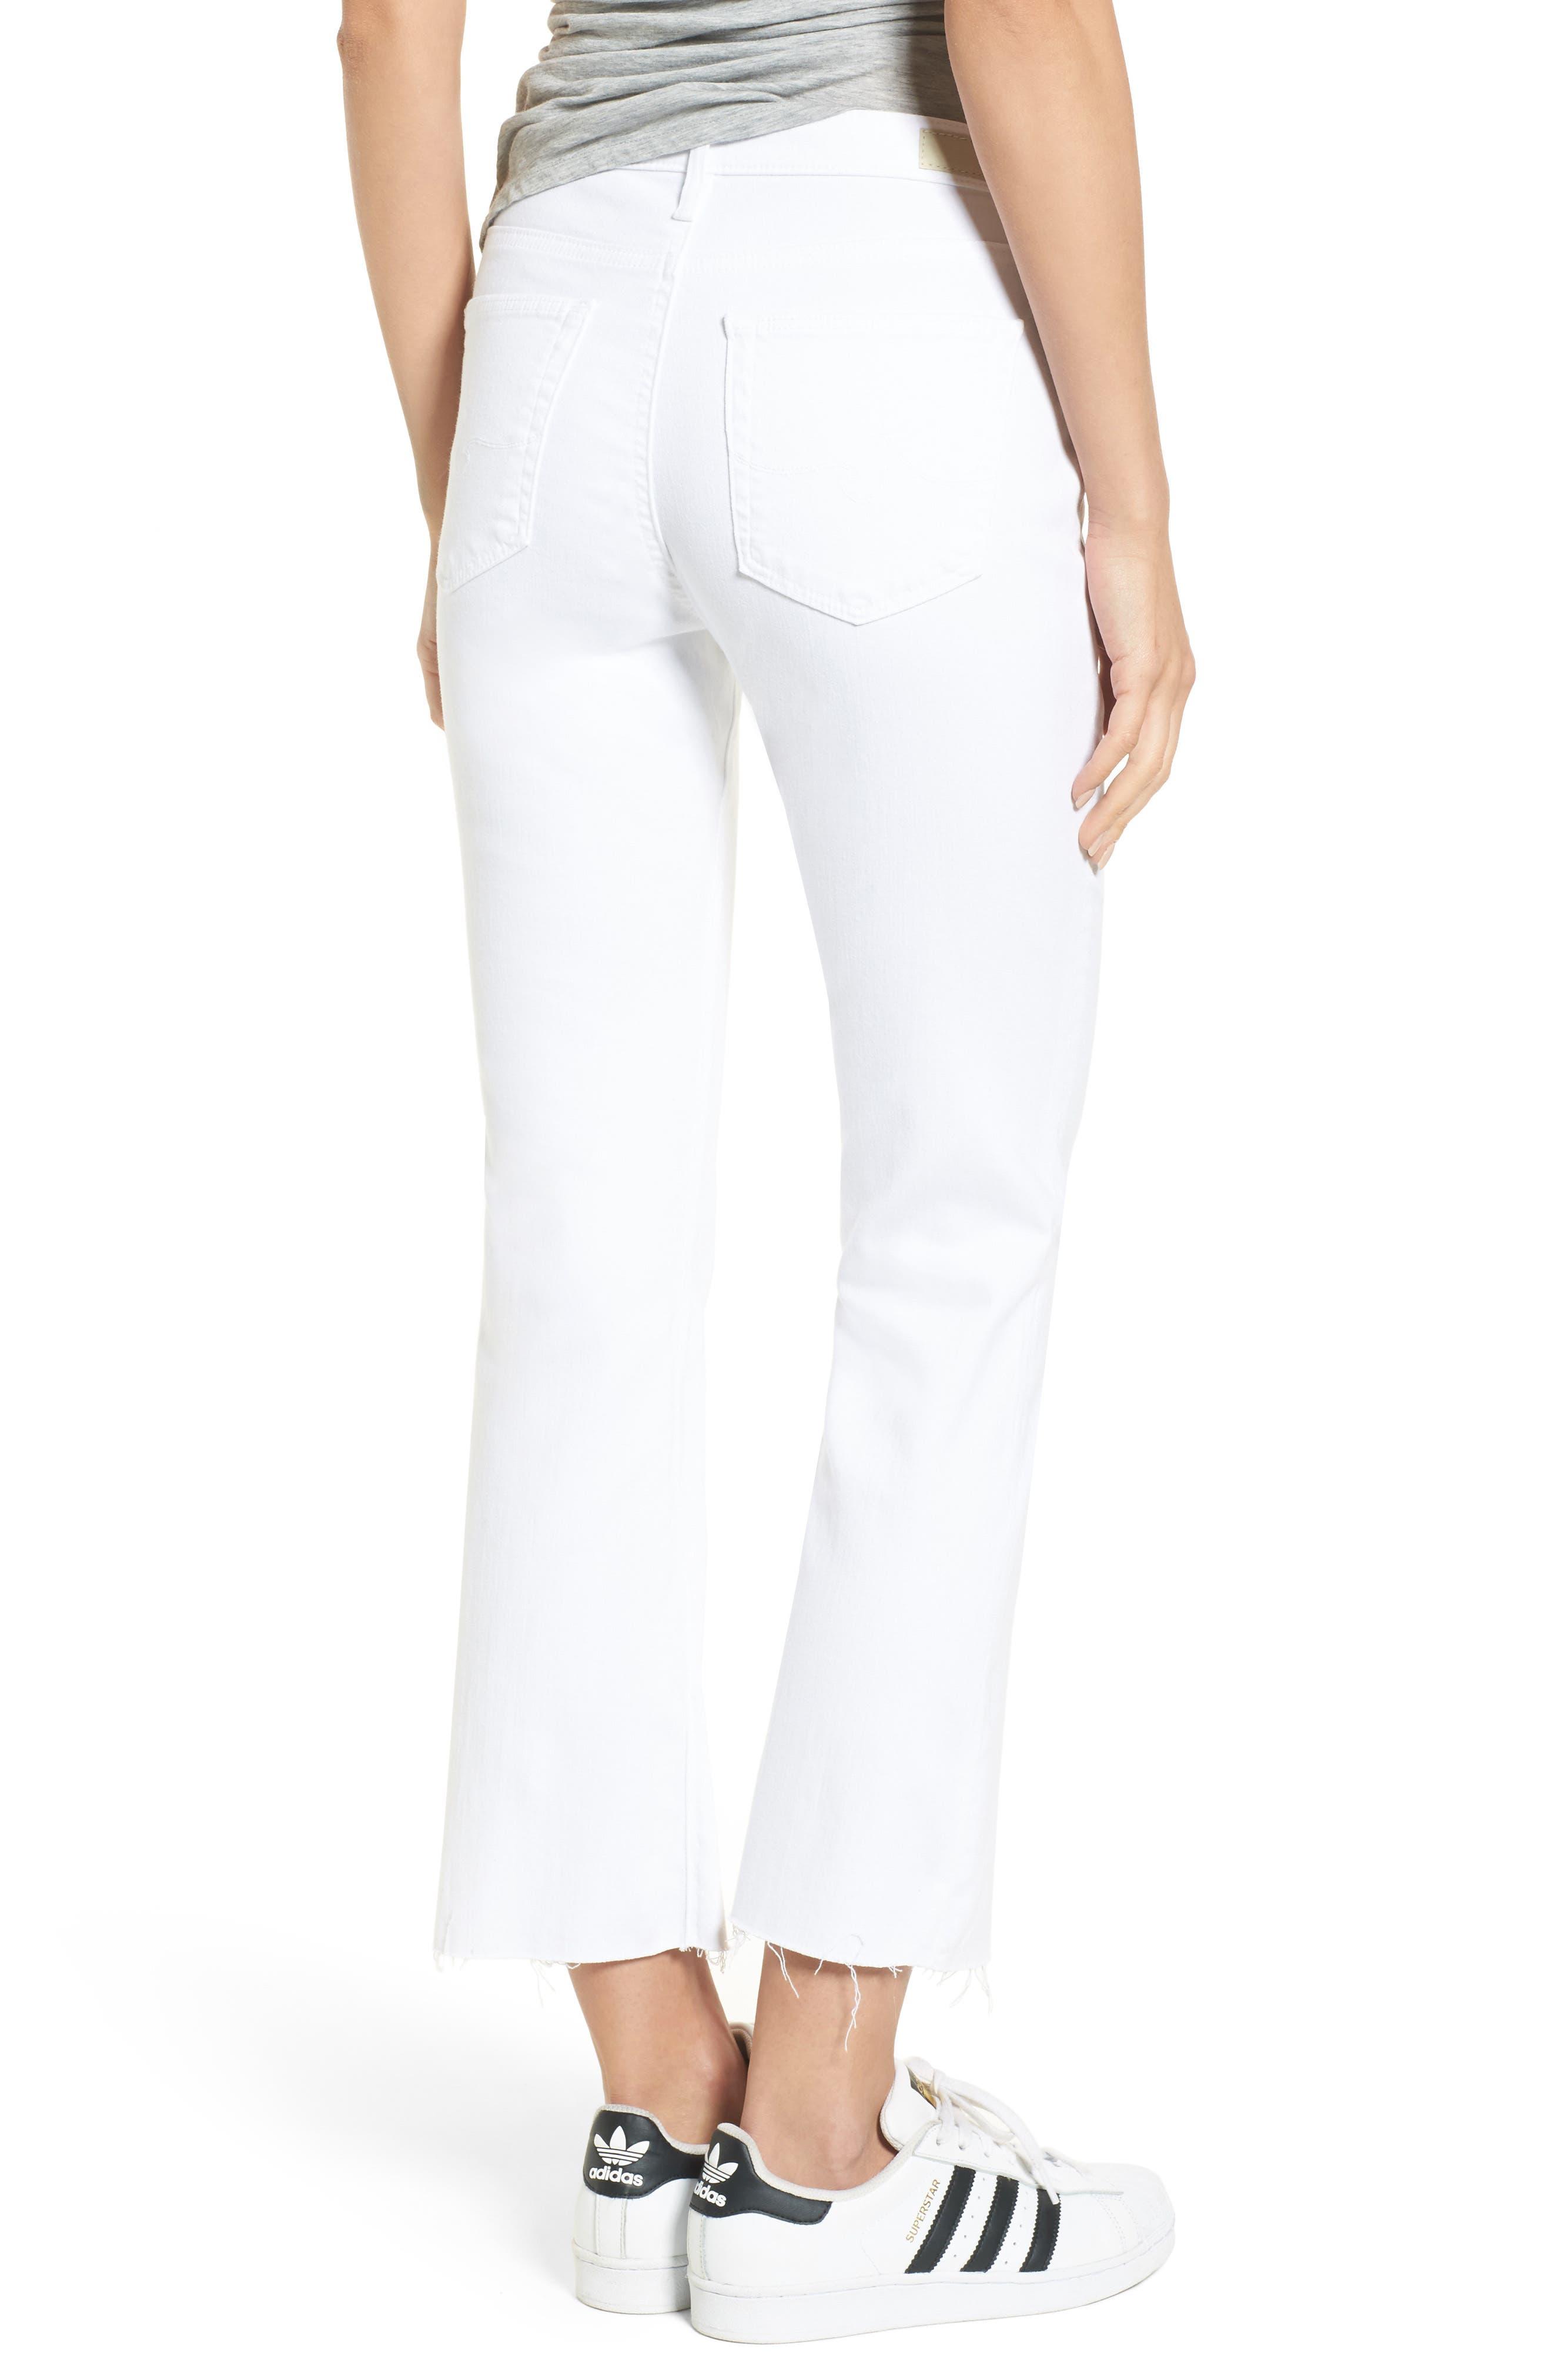 Jodi High Waist Crop Jeans,                             Alternate thumbnail 2, color,                             110